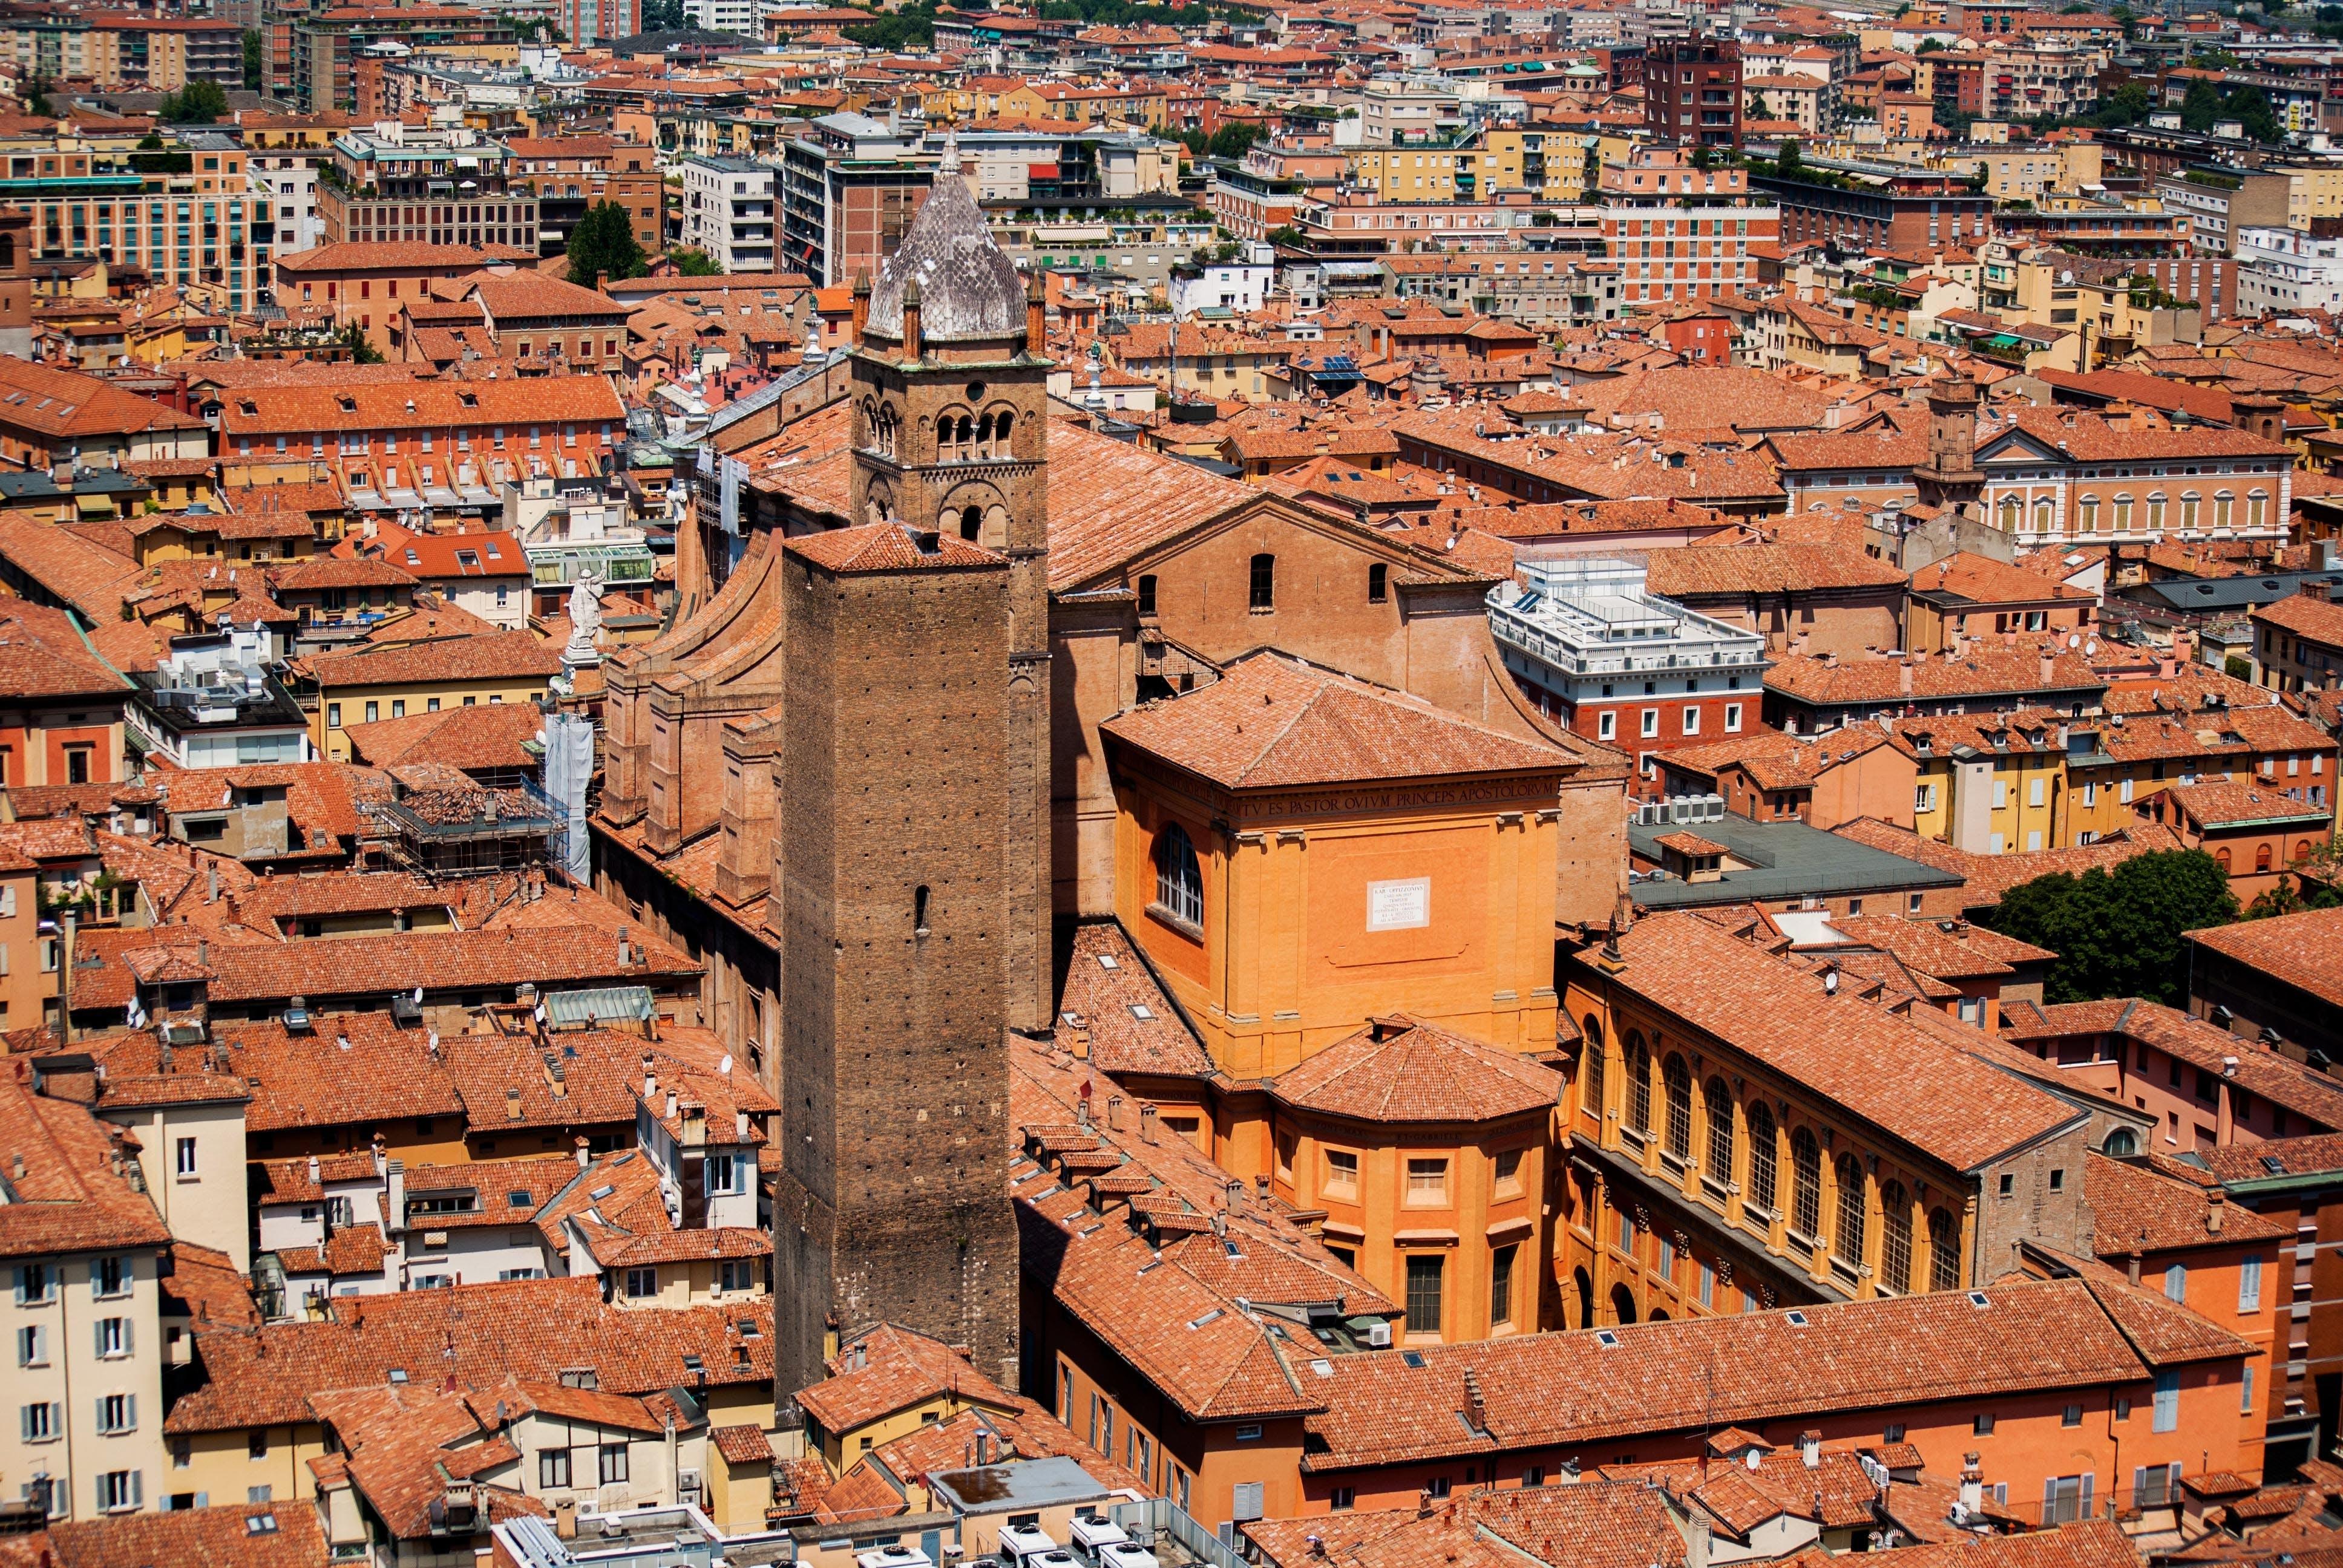 Ver la ciudad,Tours andando,Tour por Bolonia